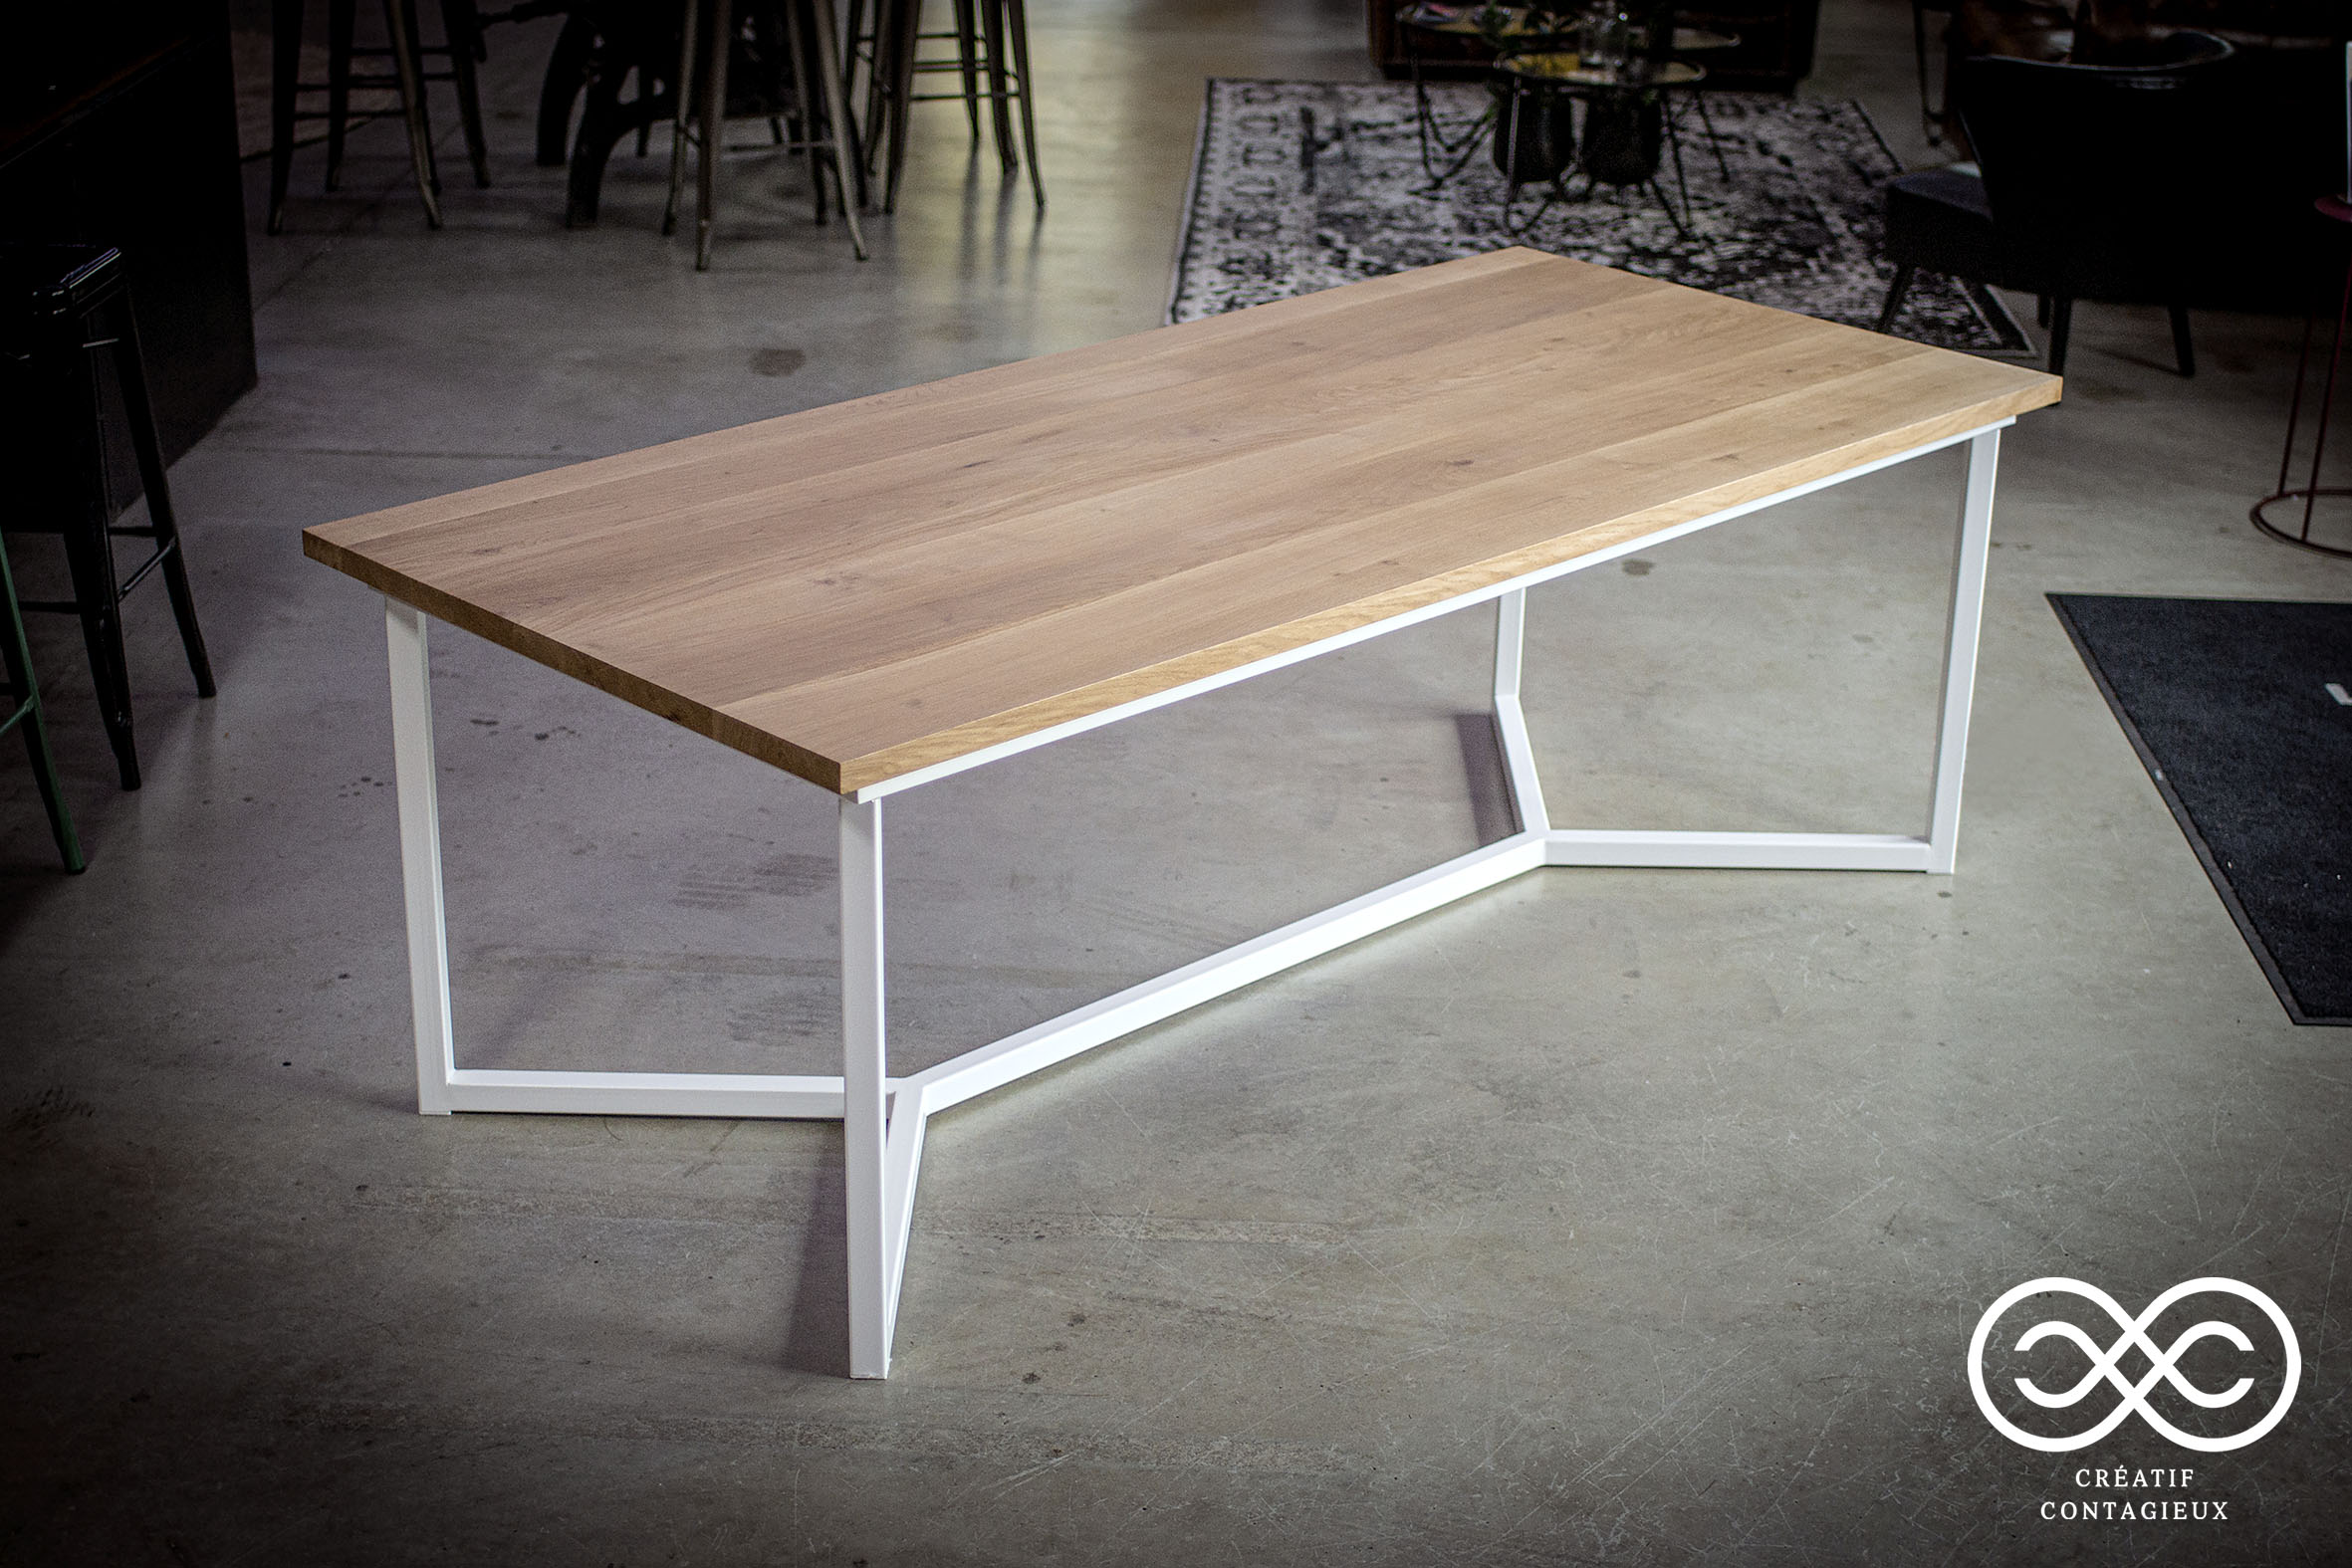 Table pied chevron blanc